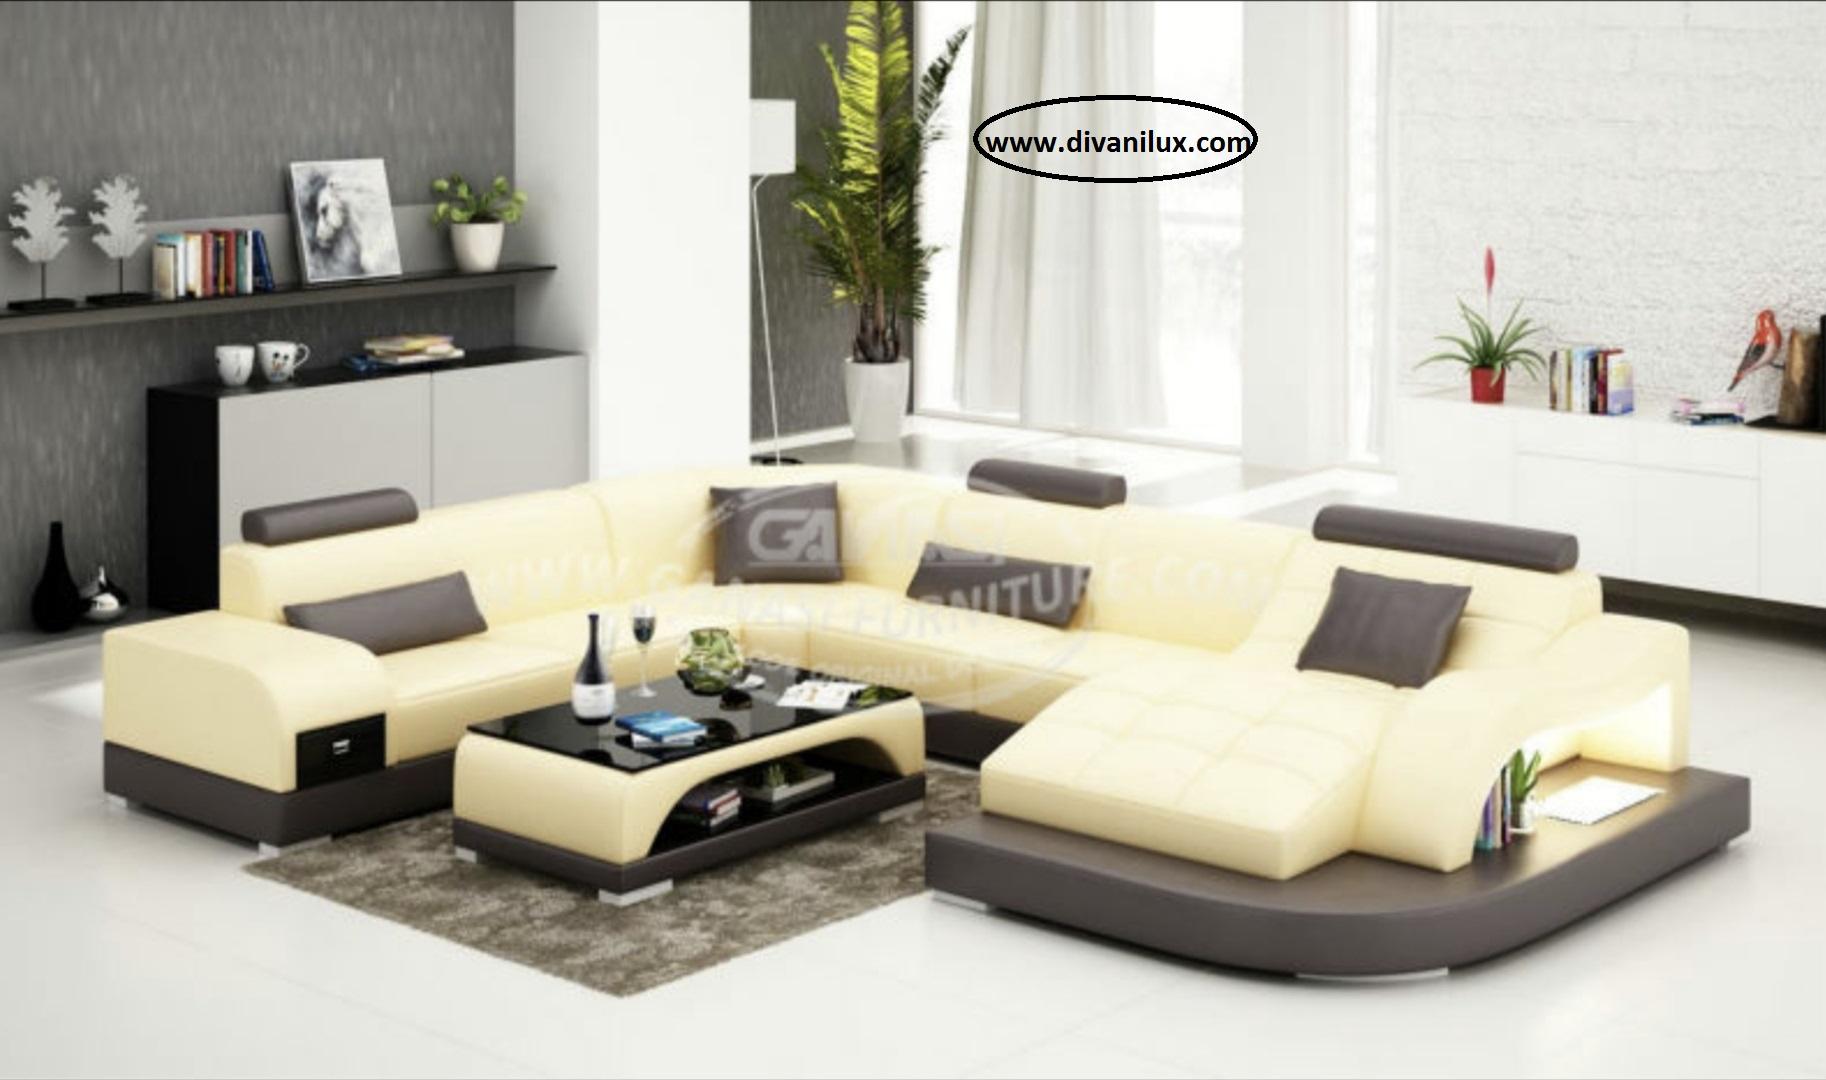 Пе-образен диван с ортопедична лежанка 886